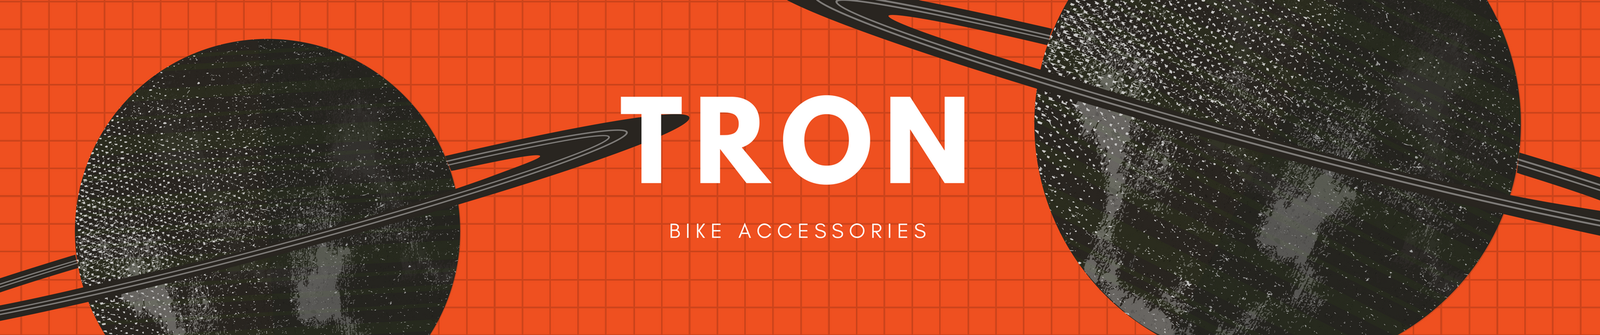 TRON Bike accessories